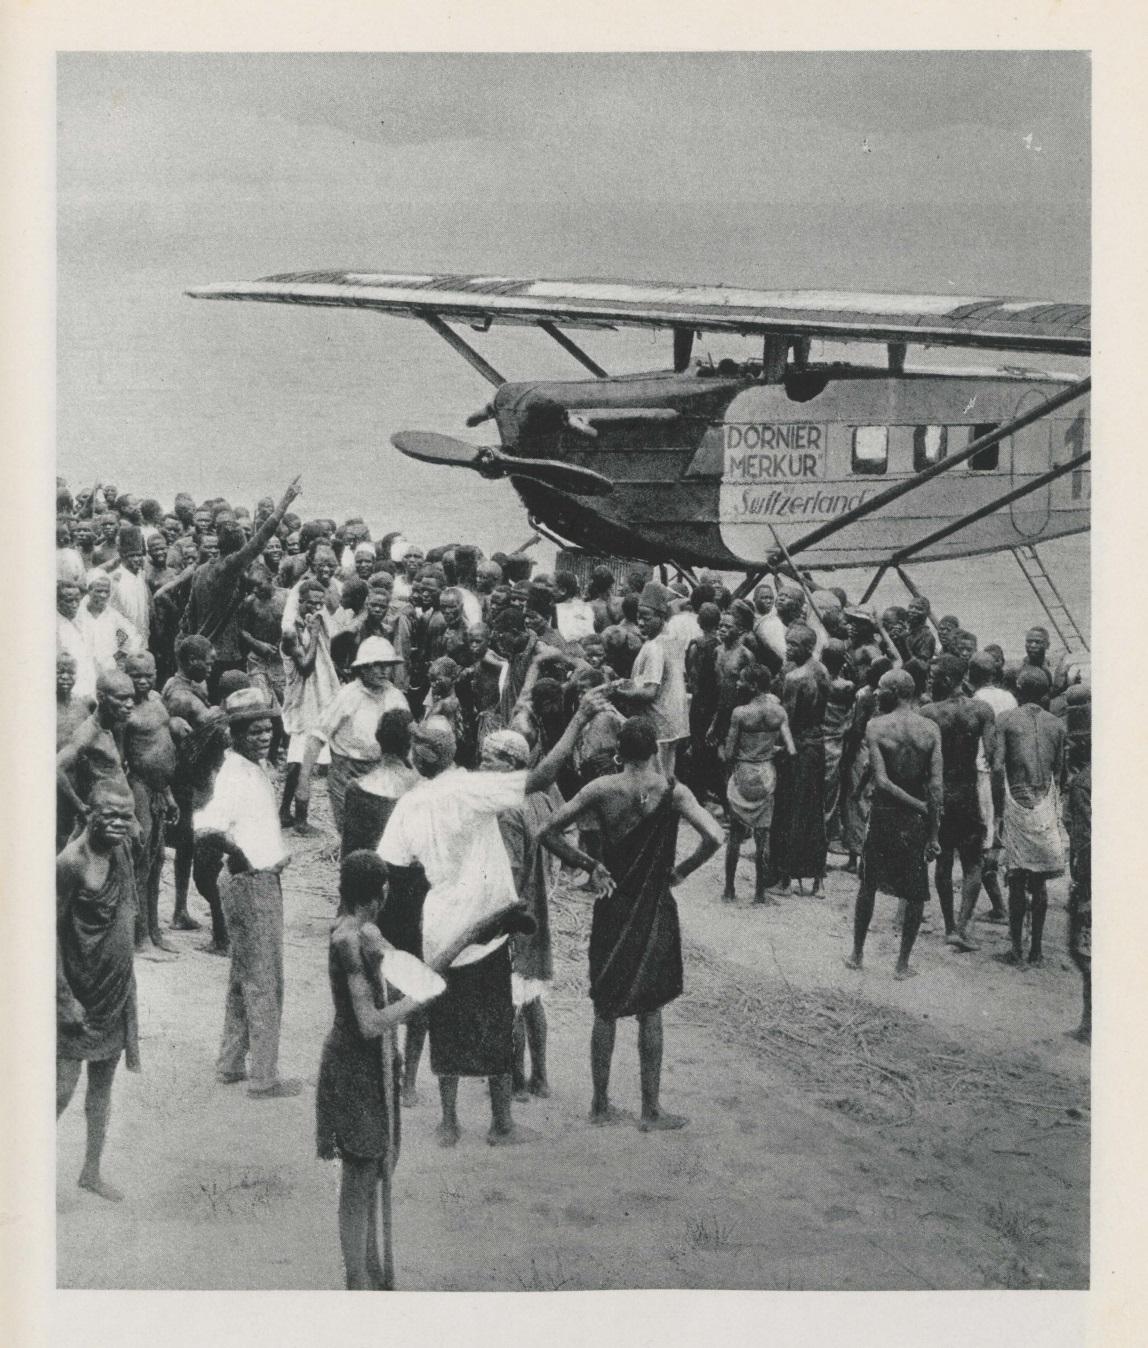 Walter Mittelholzer, Afrikaflug 1927